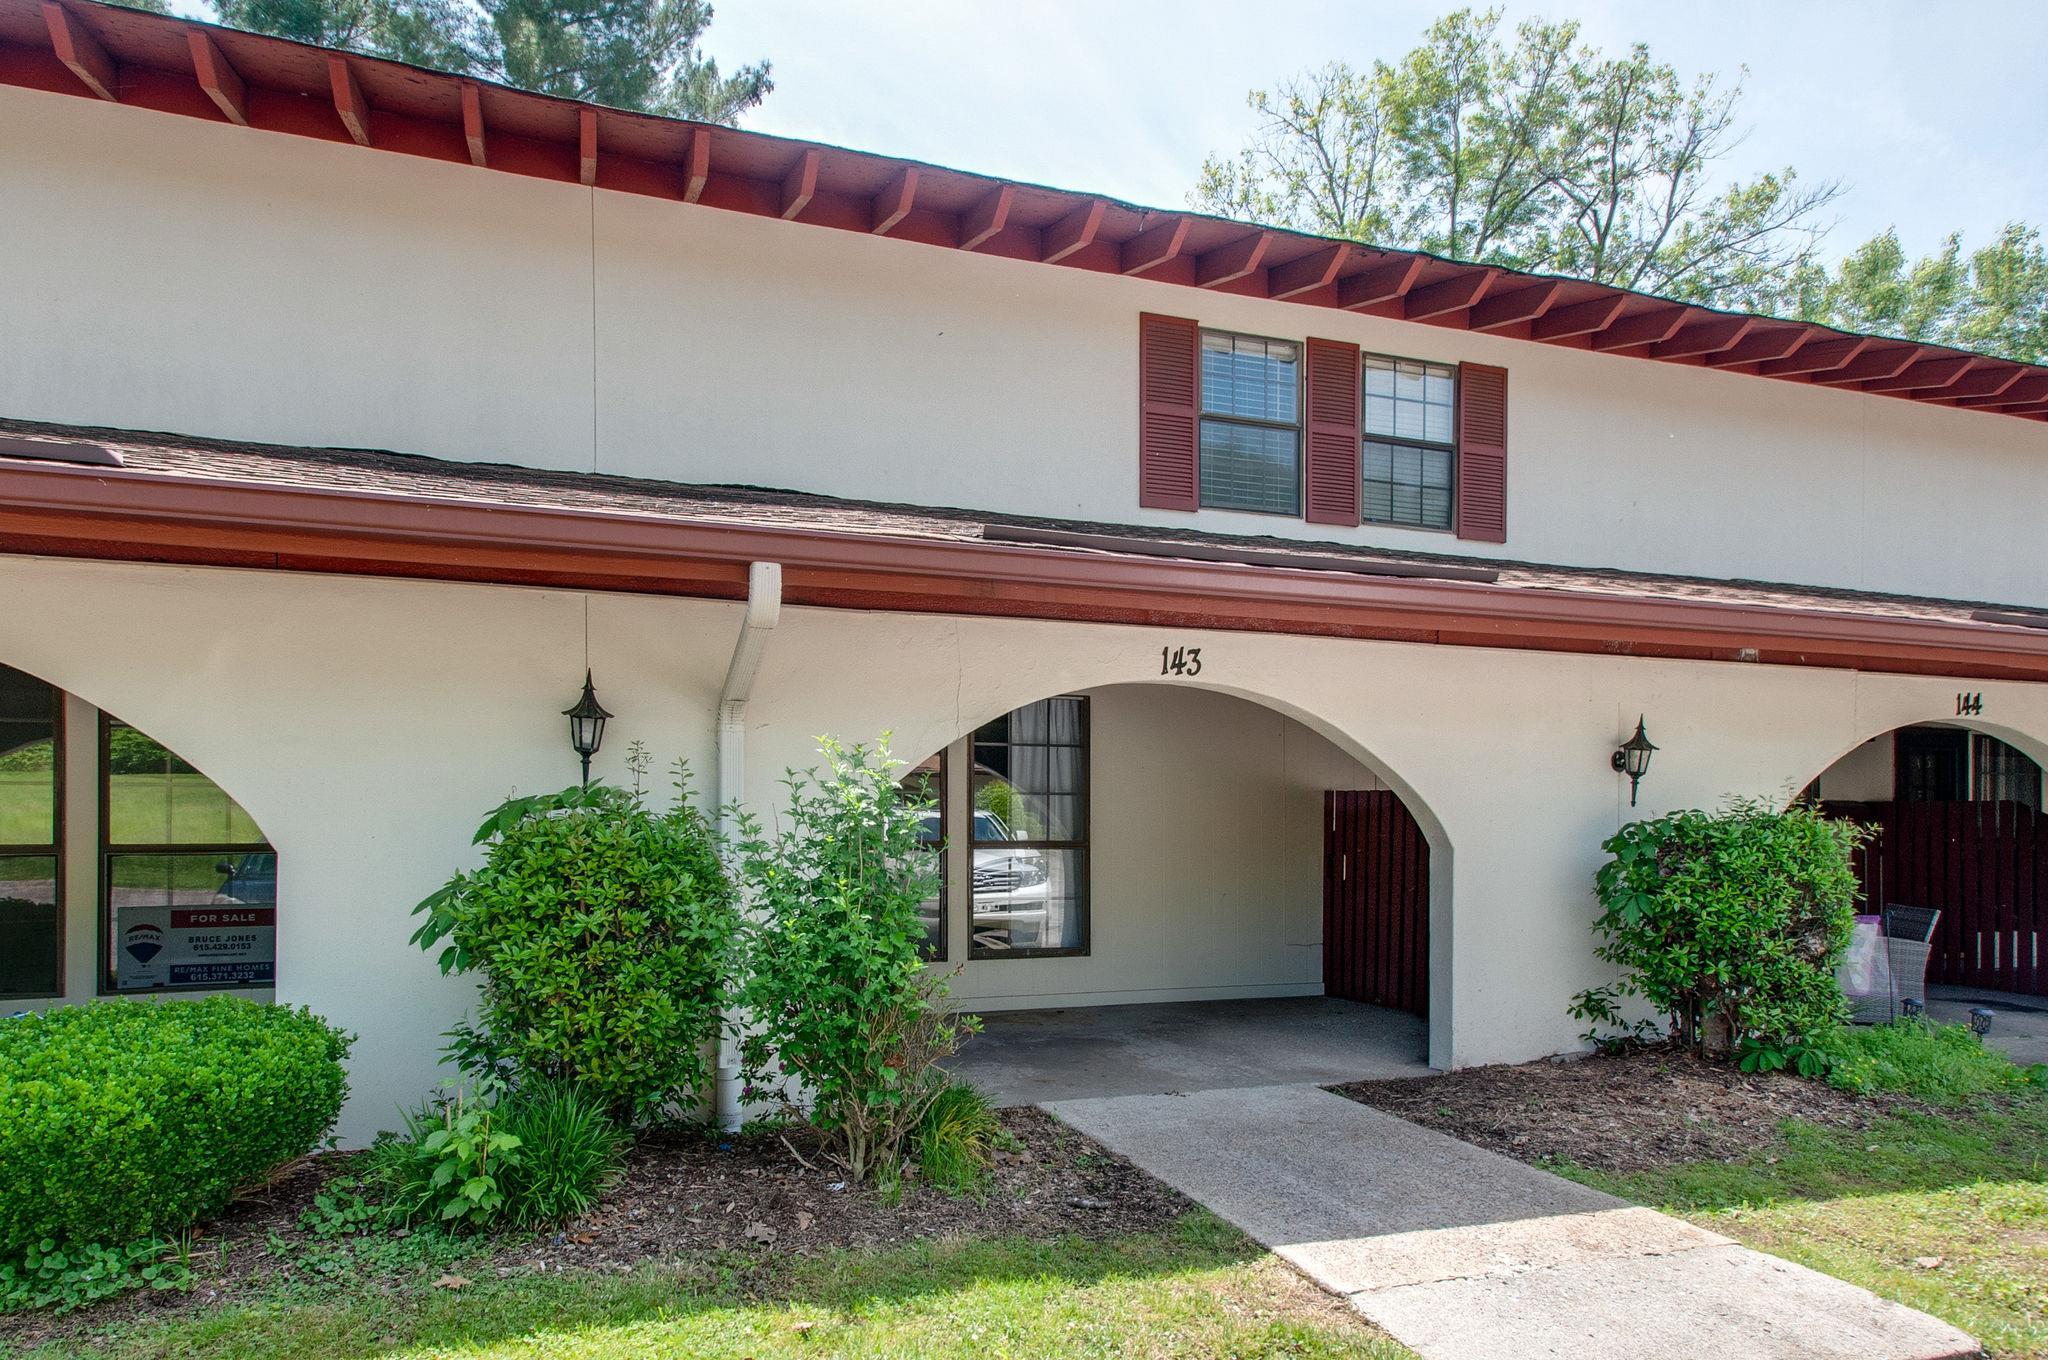 214 Old Hickory Blvd Apt 143, Nashville, TN 37221 - Nashville, TN real estate listing